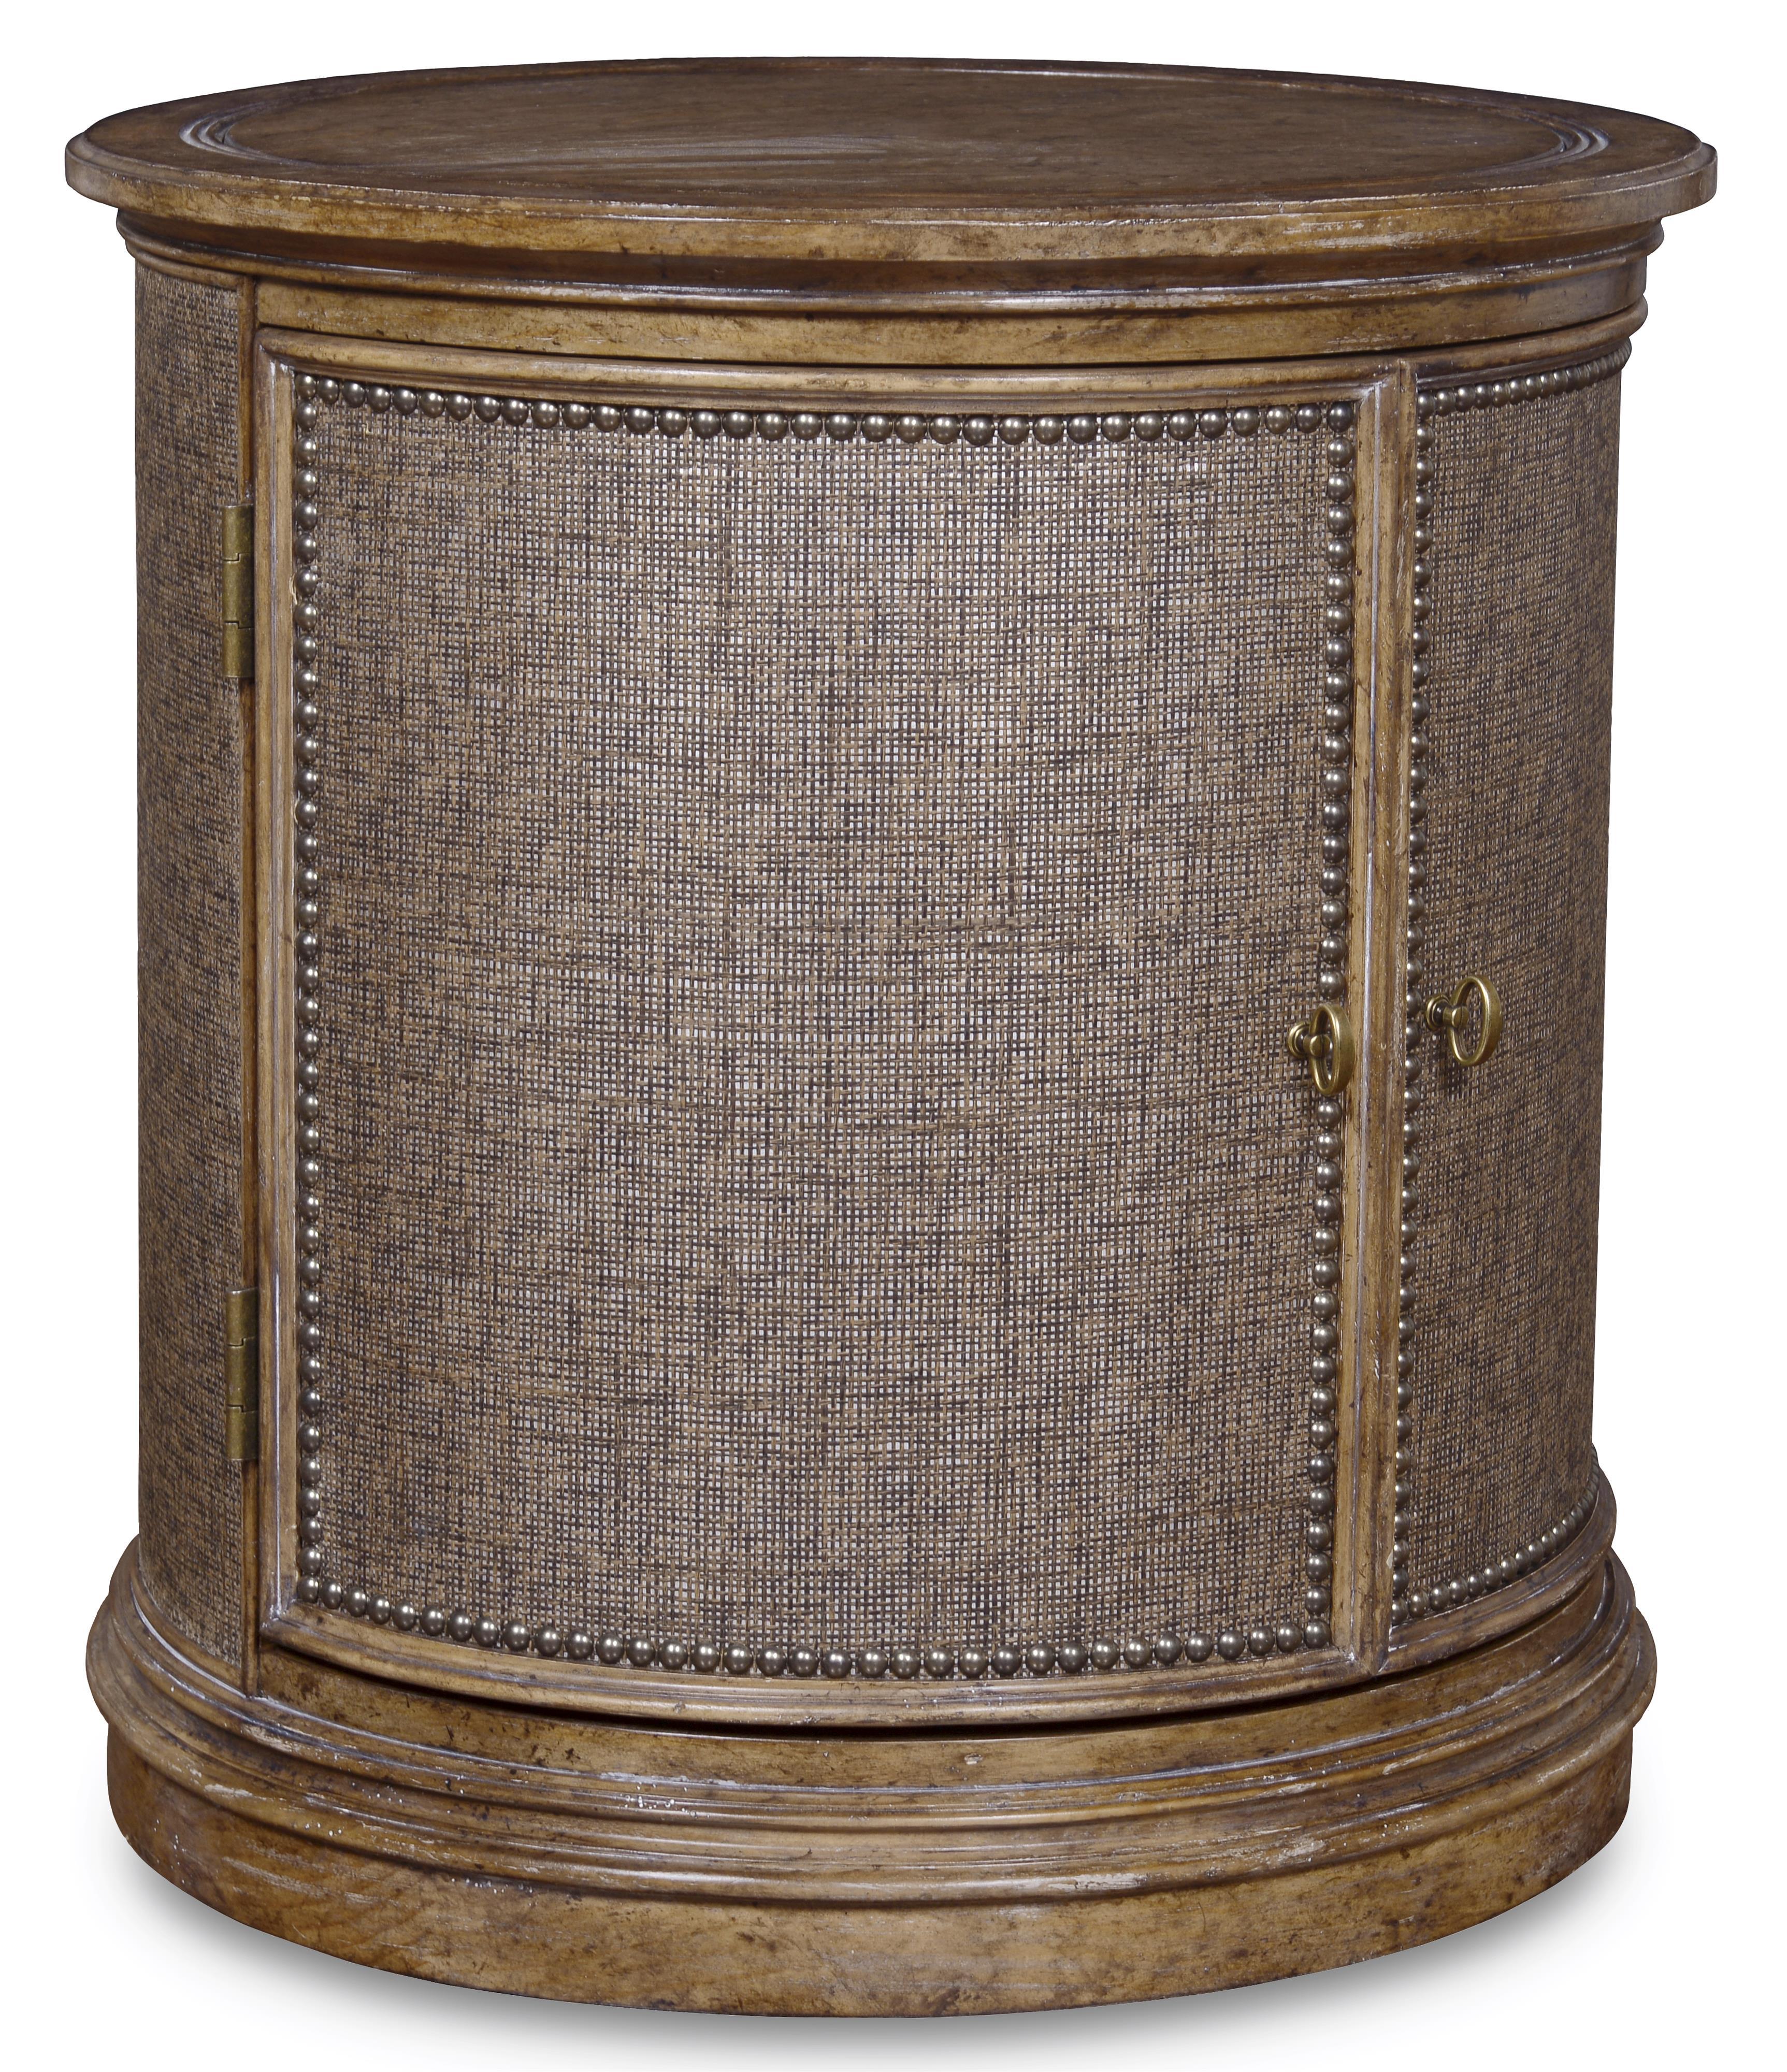 A.R.T. Furniture Inc Pavilion Drum Table - Item Number: 229304-2608